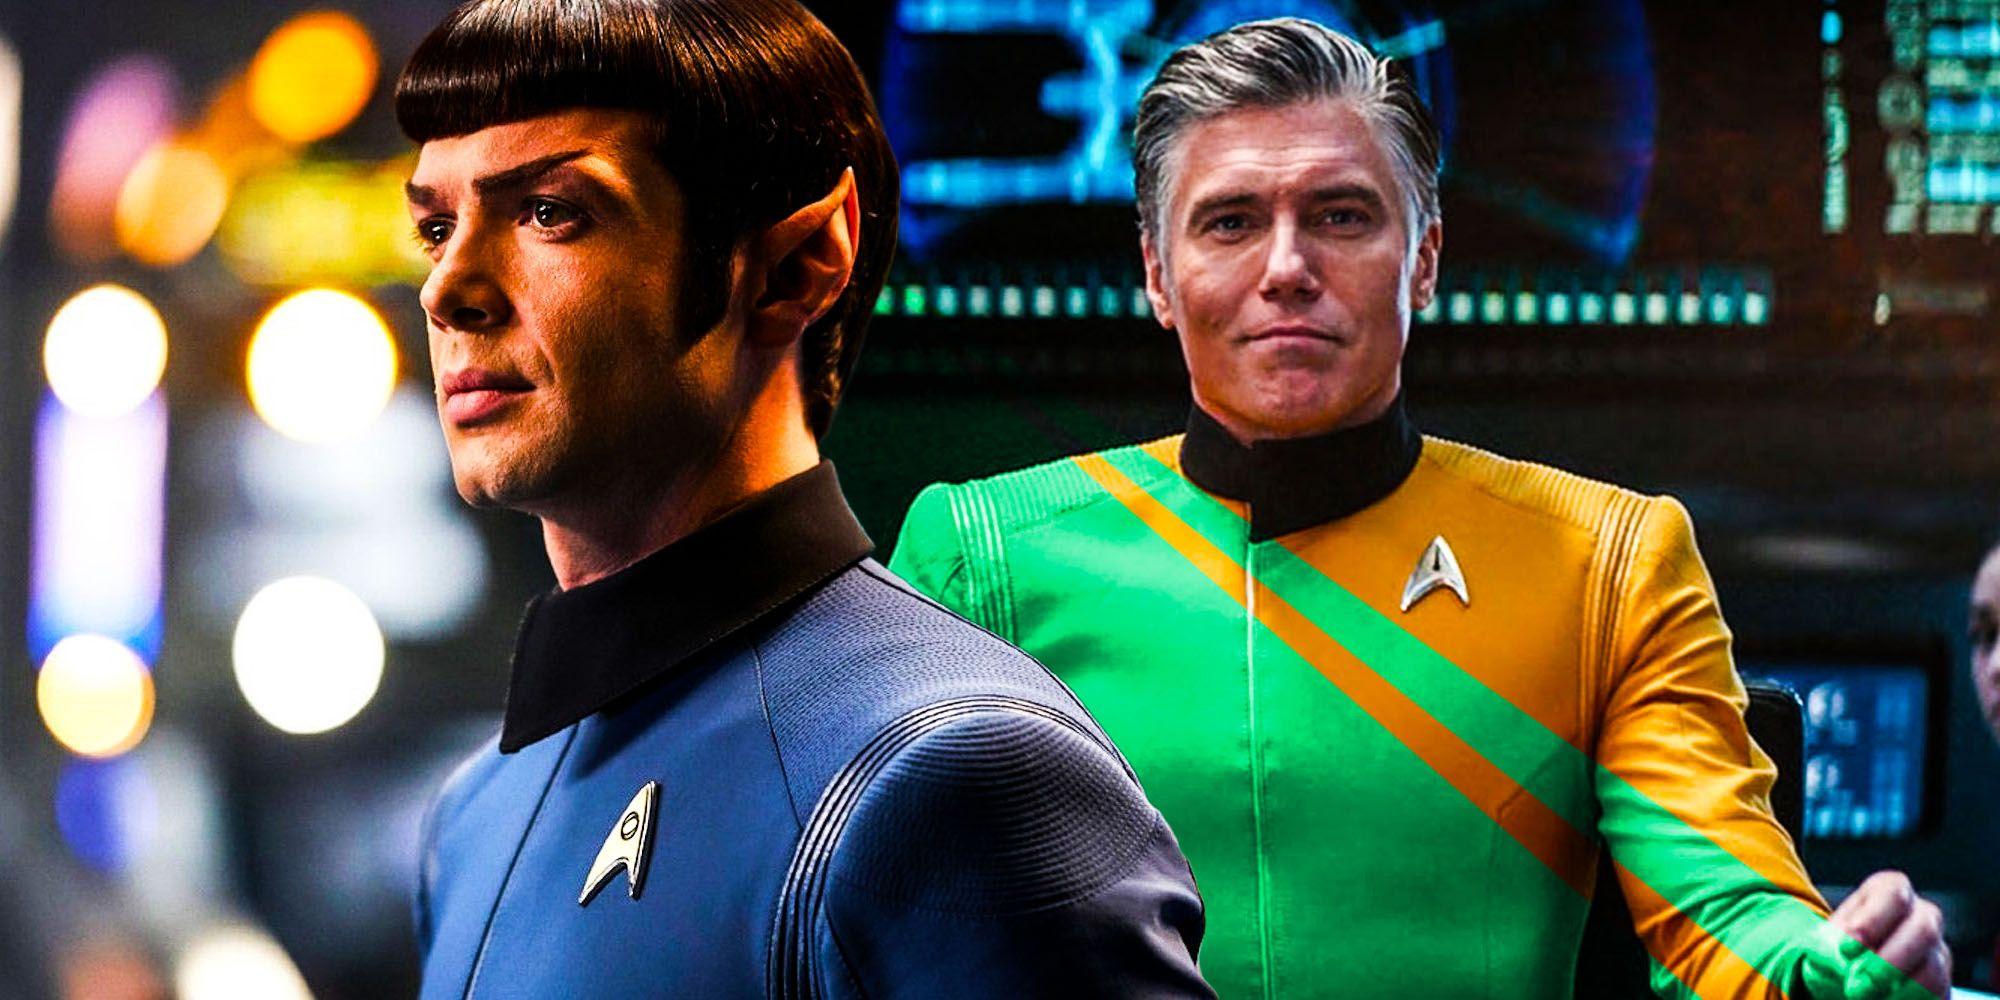 Star Trek: How Strange New Worlds Brings Back The Franchise's Best Feature